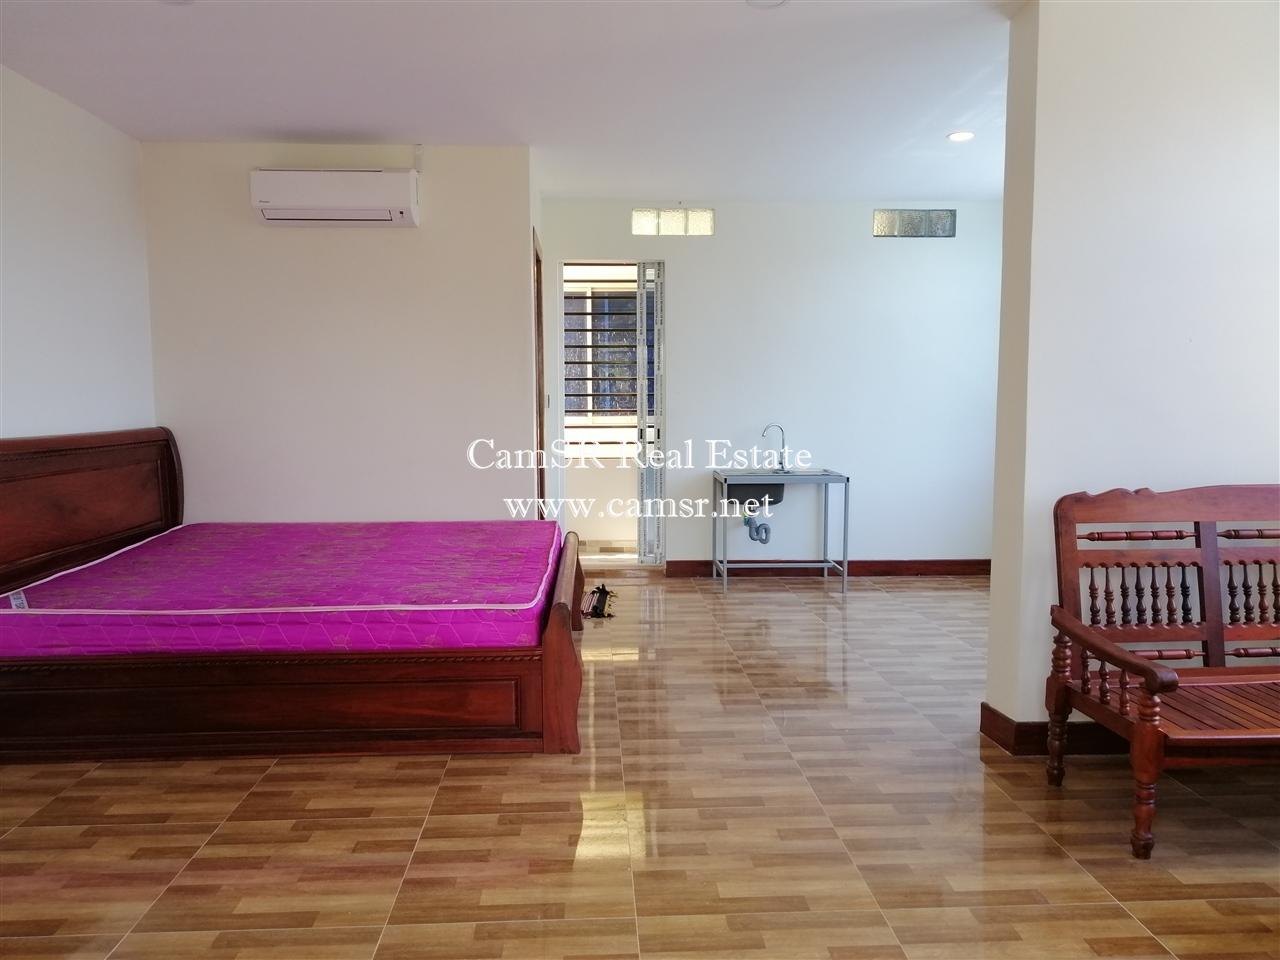 Studio Room For Rent in Siem Reap-Sala Kamreuk